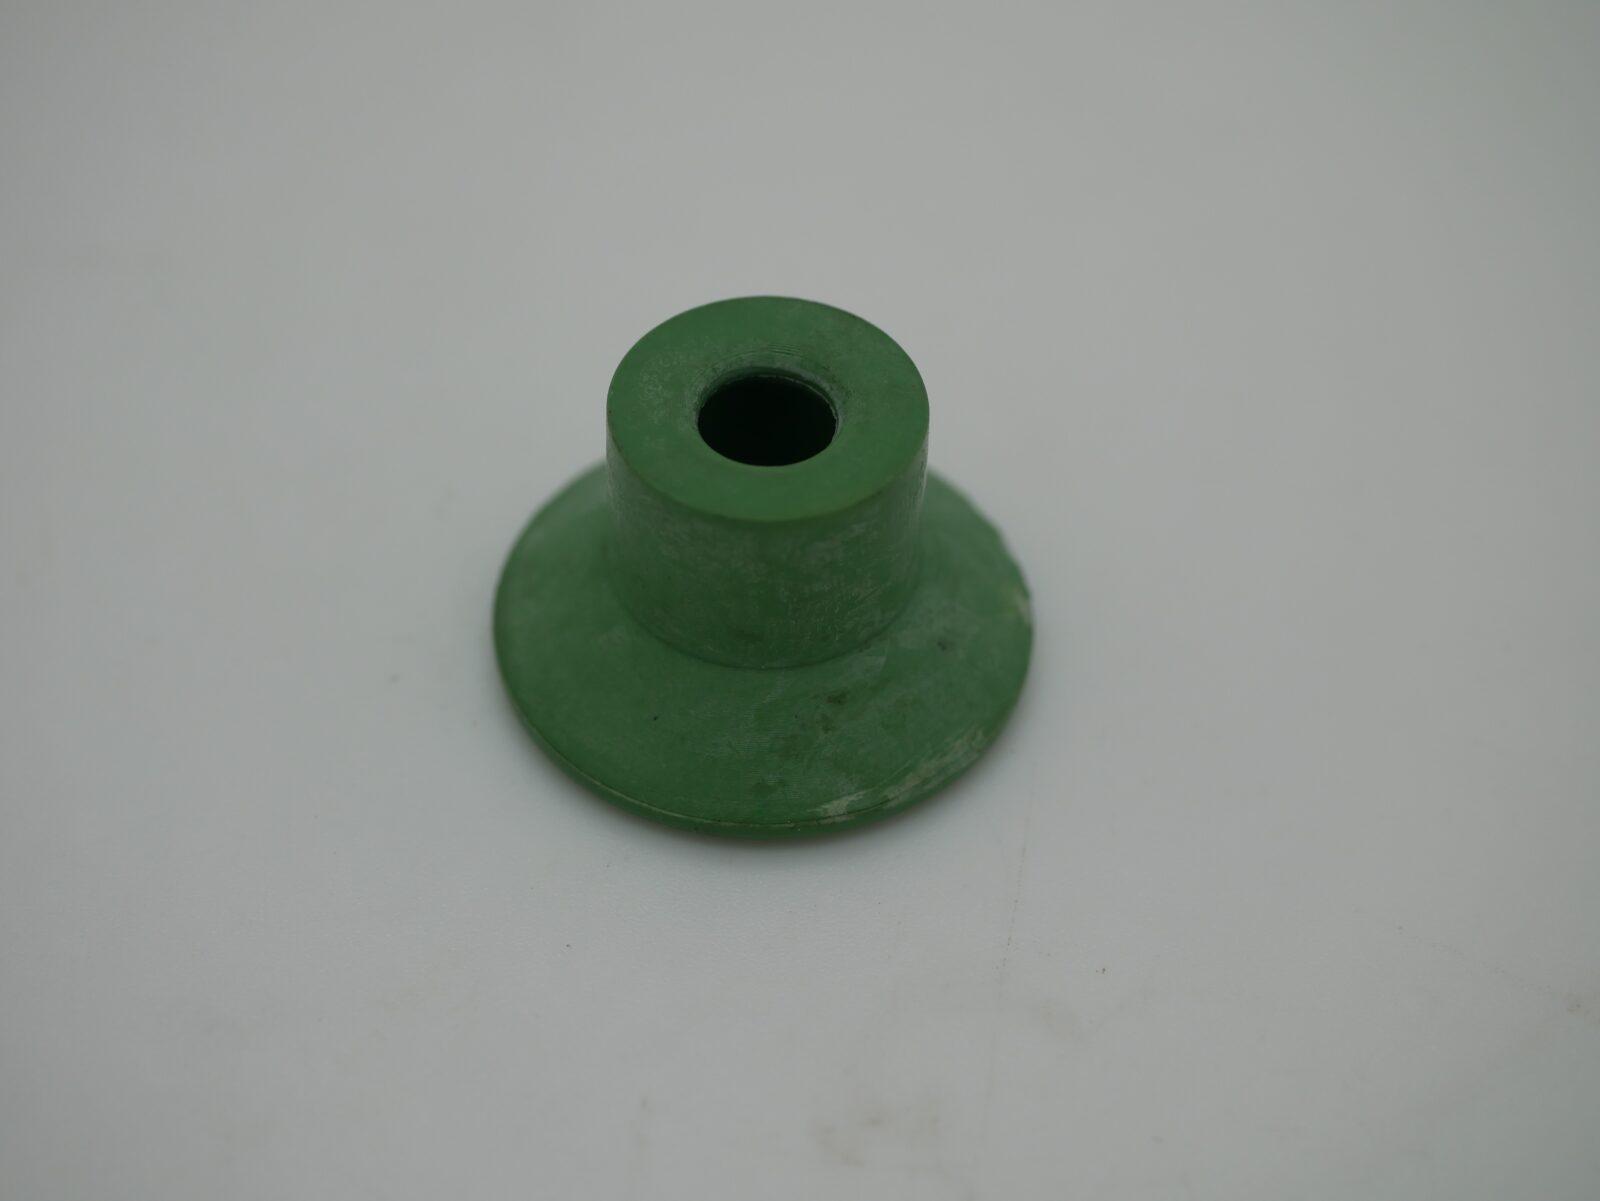 Green Muller Martini 25 x 6 x 15mm A267-O